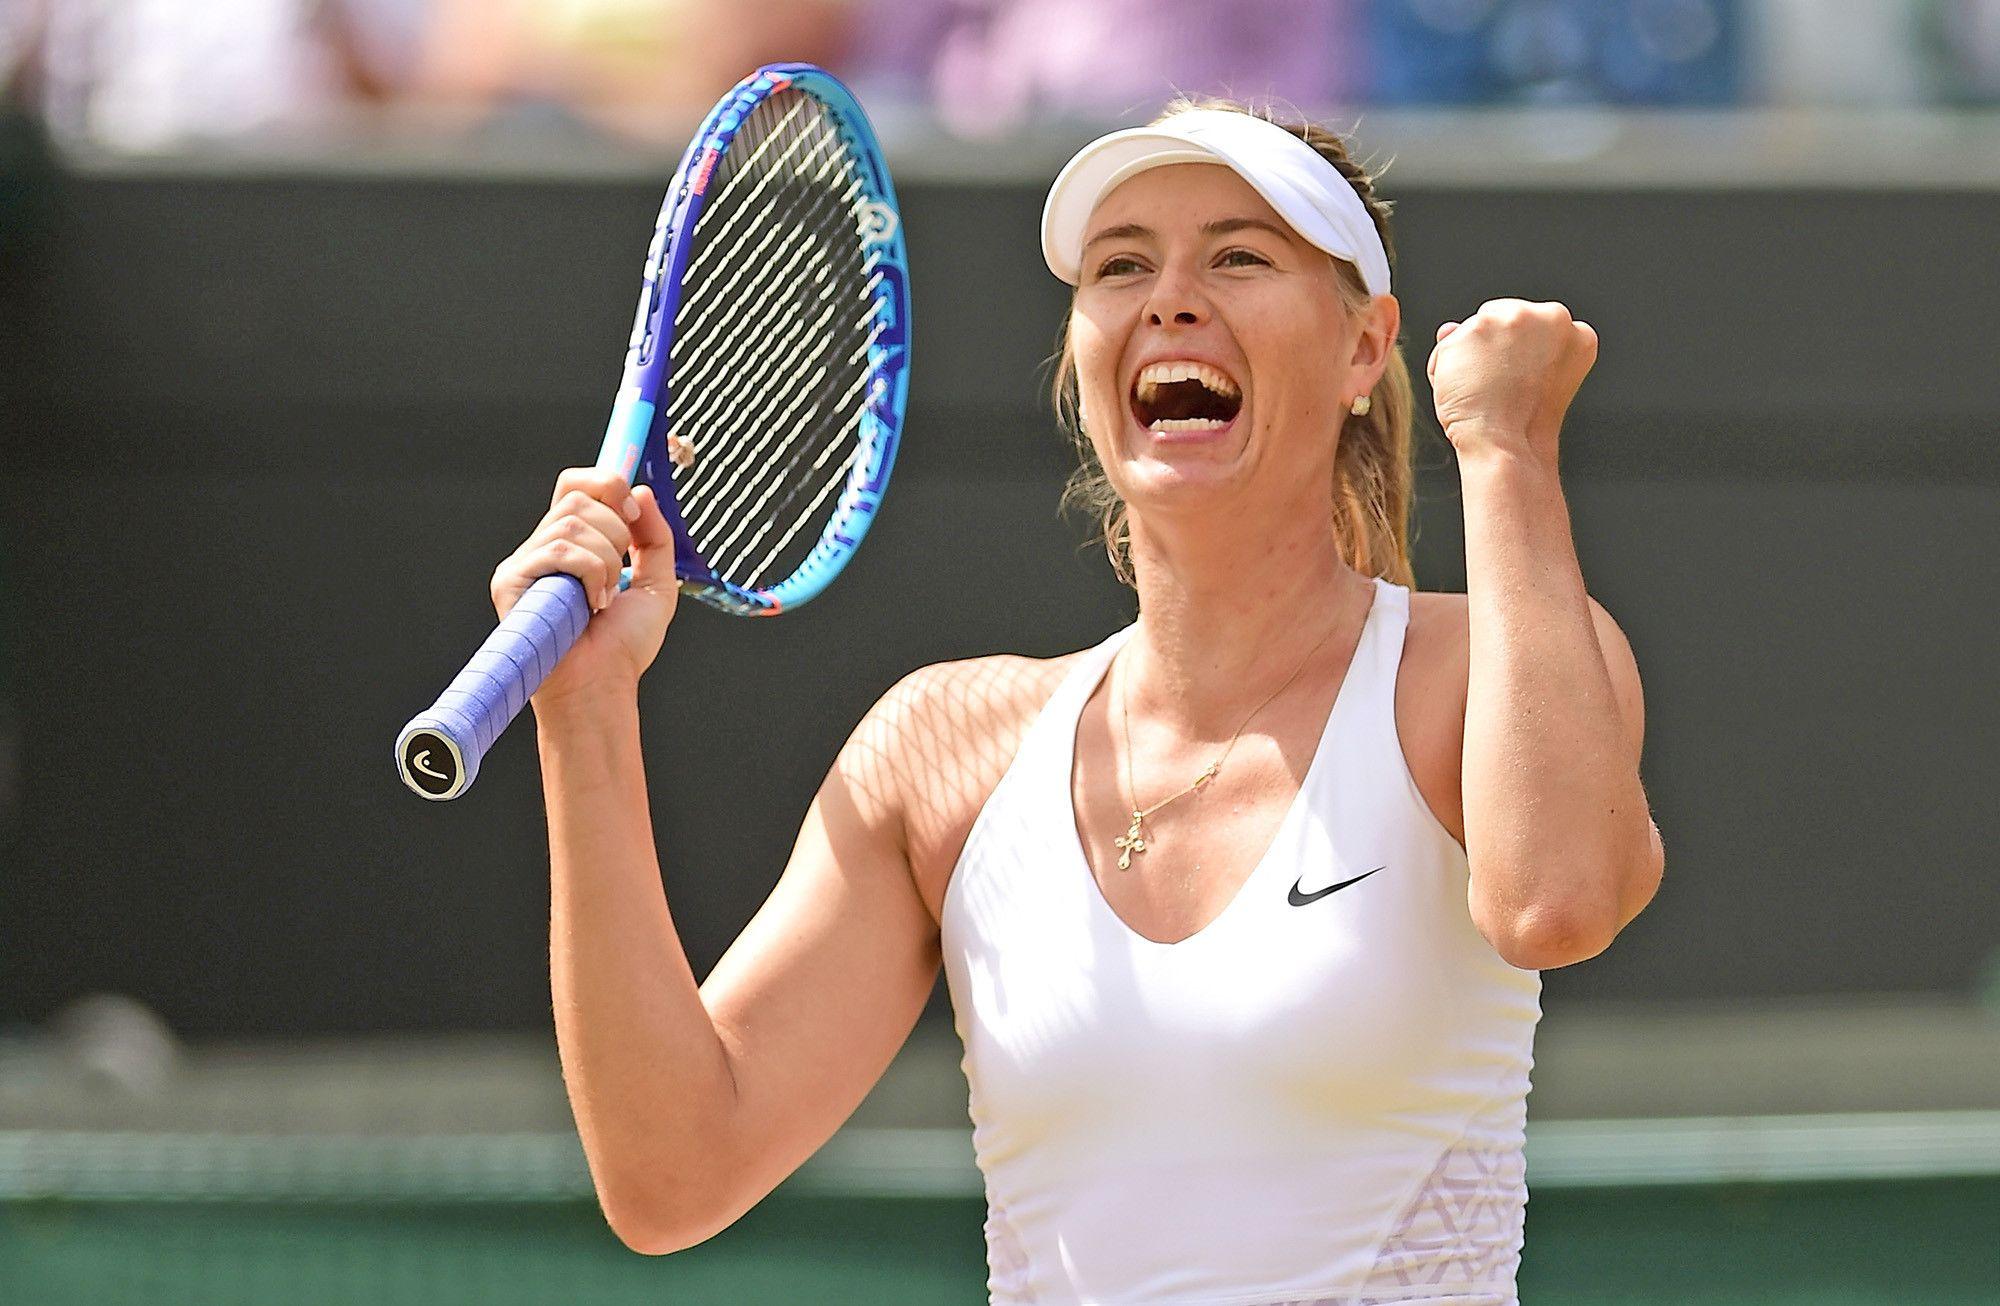 Sweaty Maria Sharapova : HottestFemaleAthletes